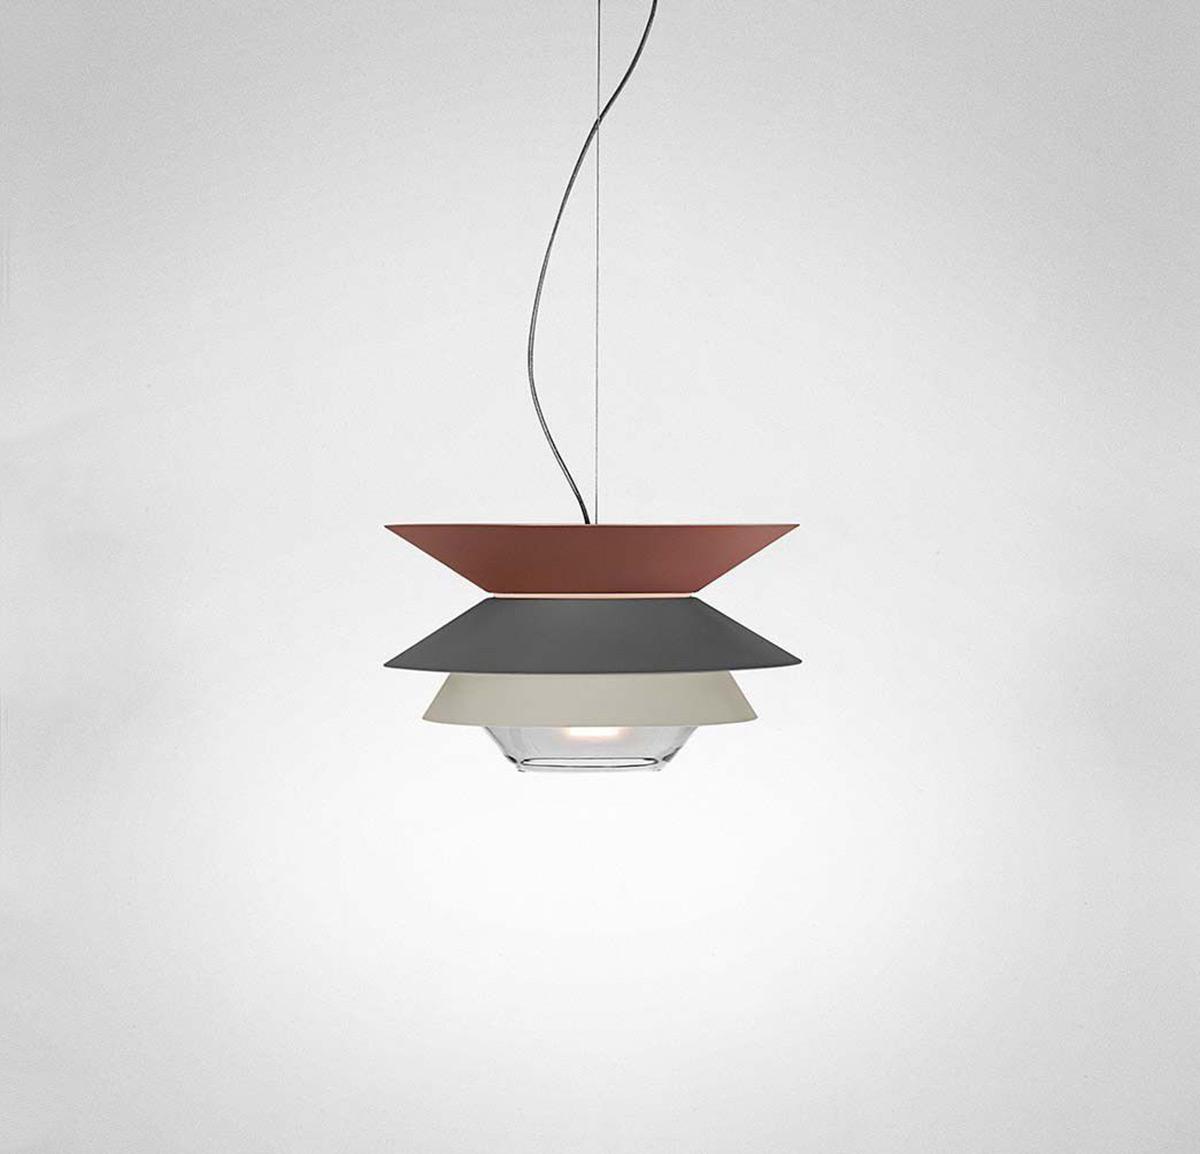 Ginkgo-Lamp-Tim-Brauns-06